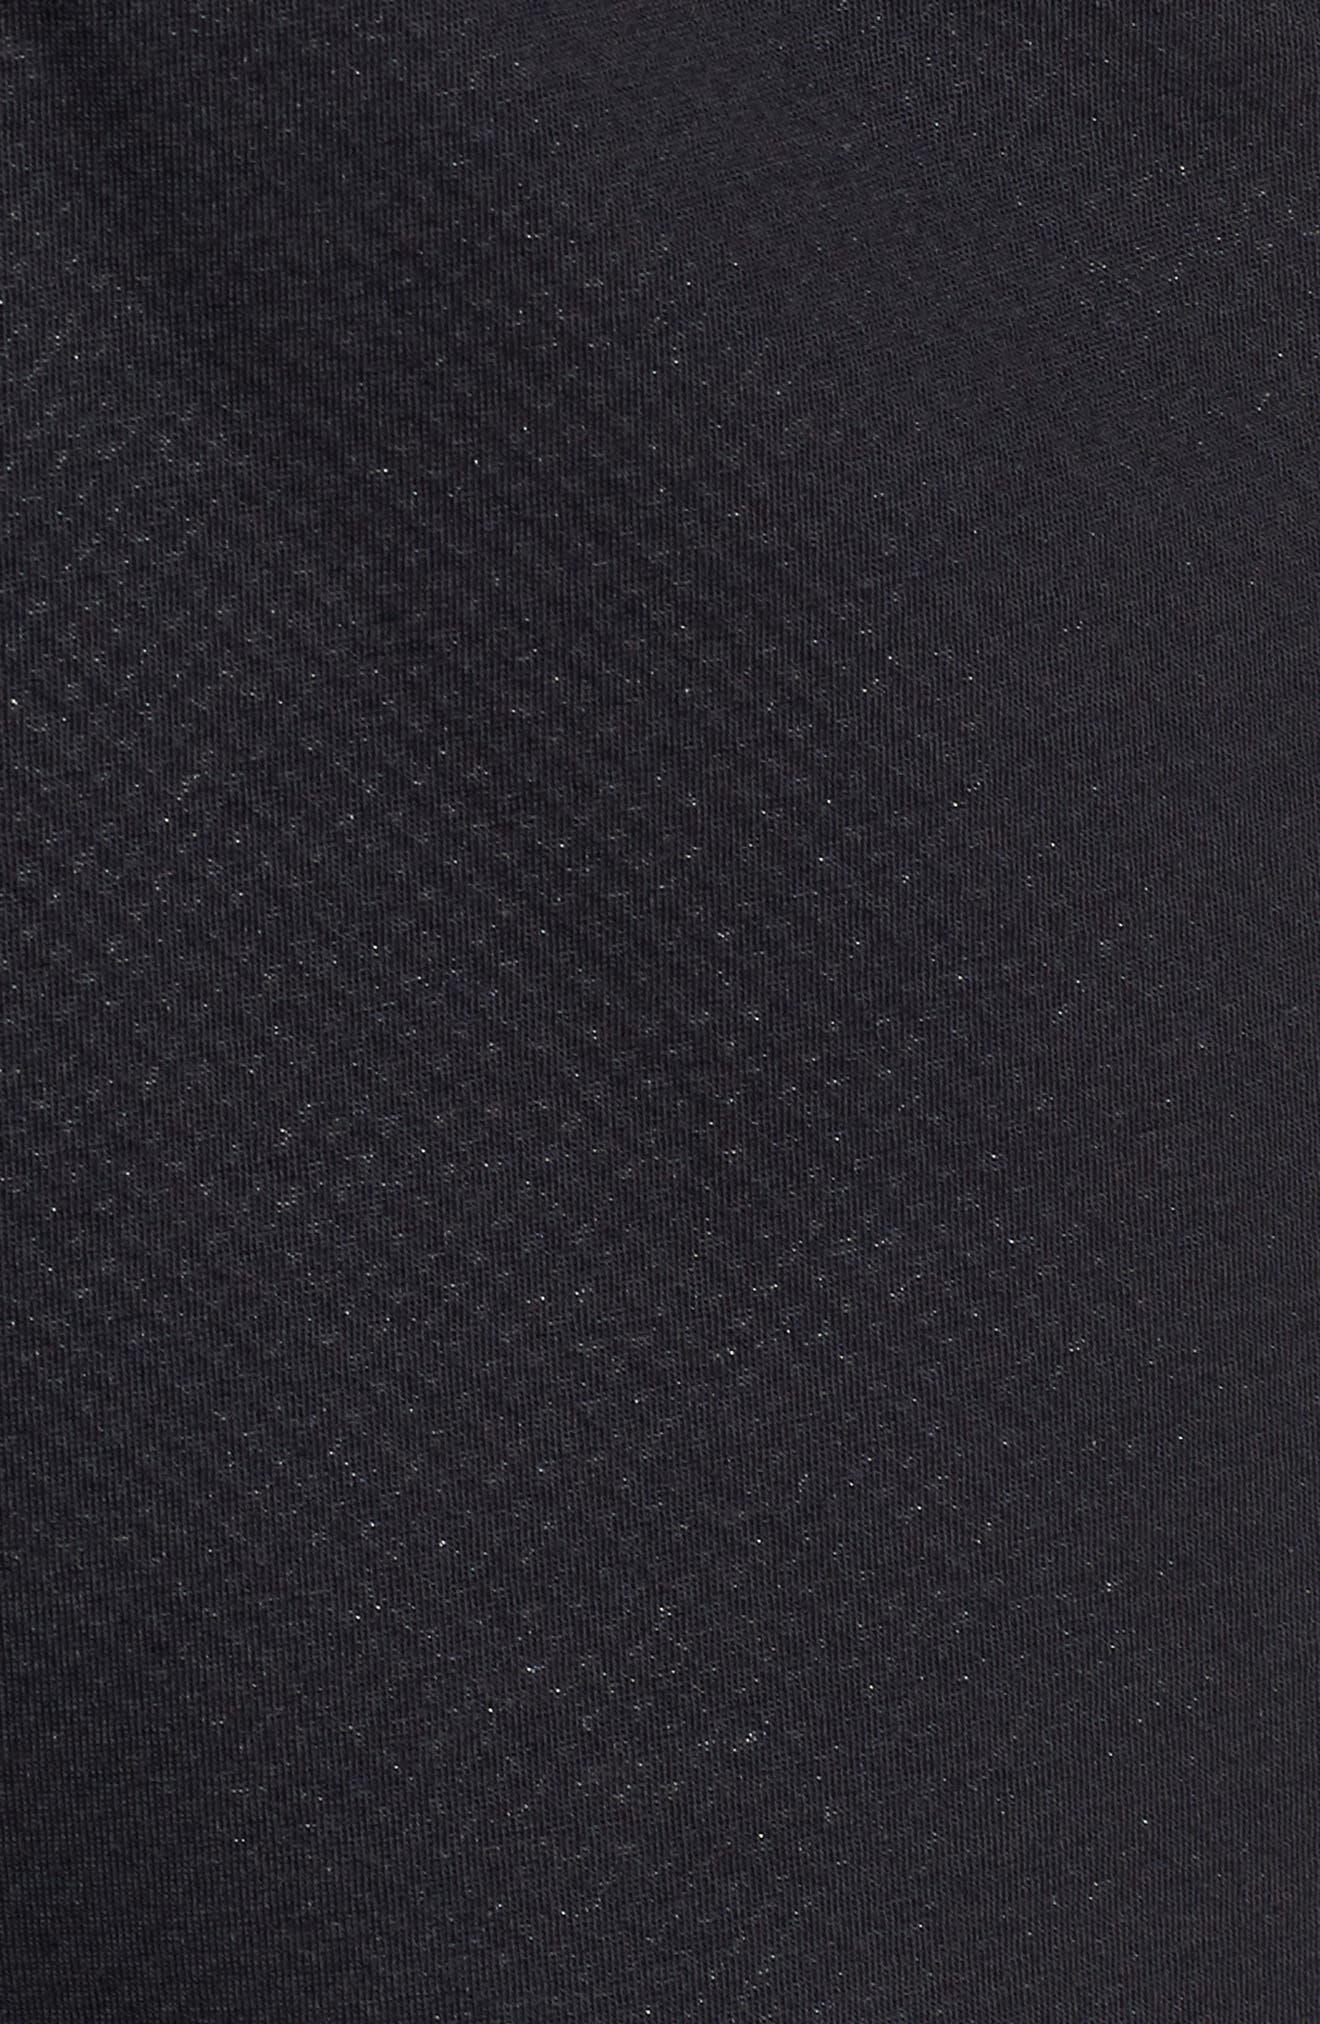 Unstoppable Swacket Training Pants,                             Alternate thumbnail 5, color,                             BLACK FULL HEATHER/ BLACK